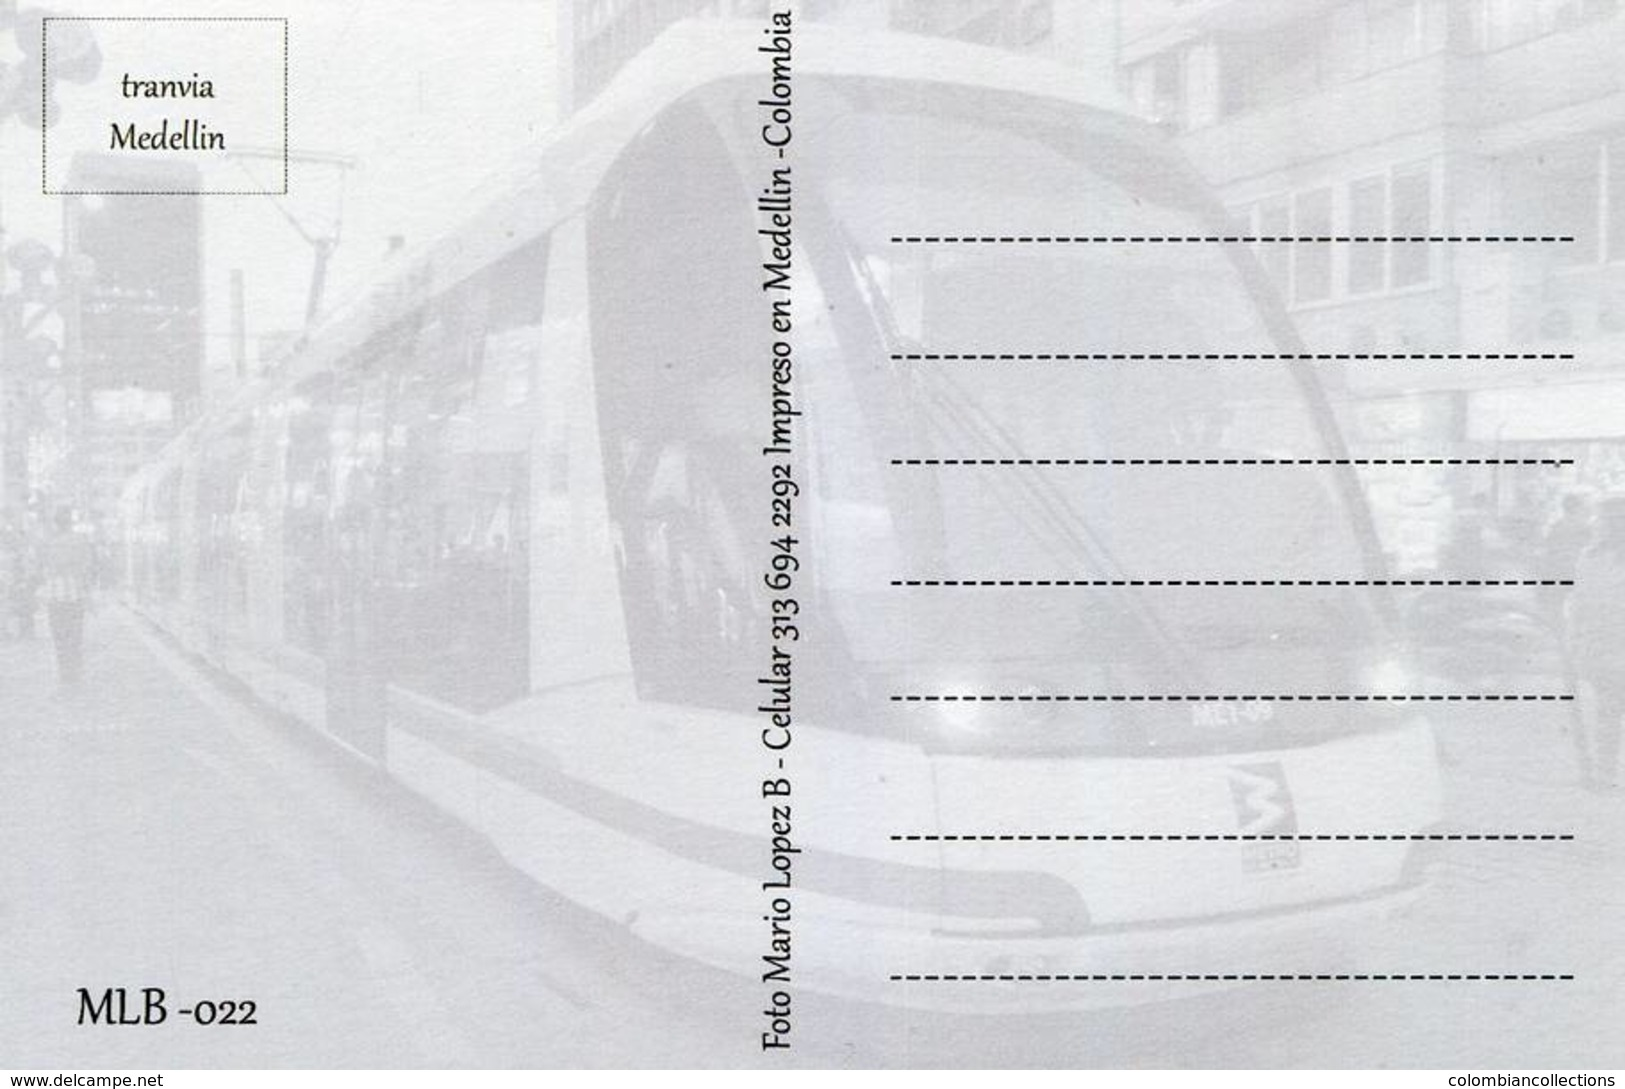 Lote PEP1045, Colombia, Postal, Postcard, Medellin, Tranvia, MLB-022, Tram, Streetcar - Colombia